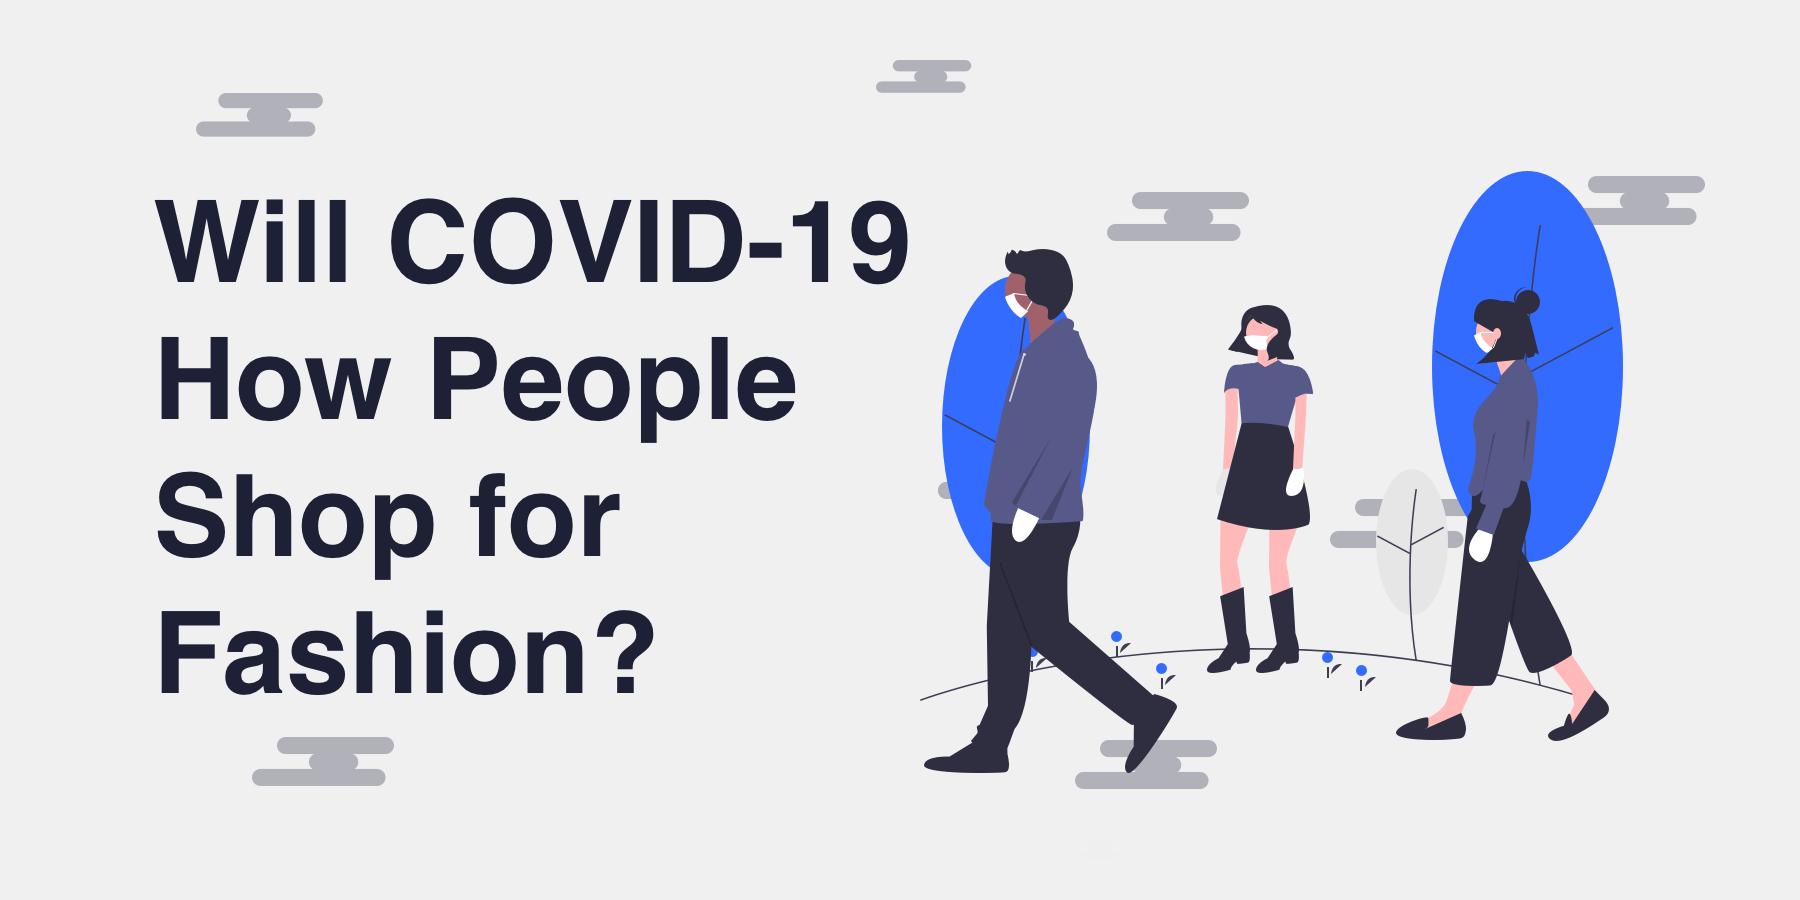 Will COVID-19 change fashion consumer behaviour online?